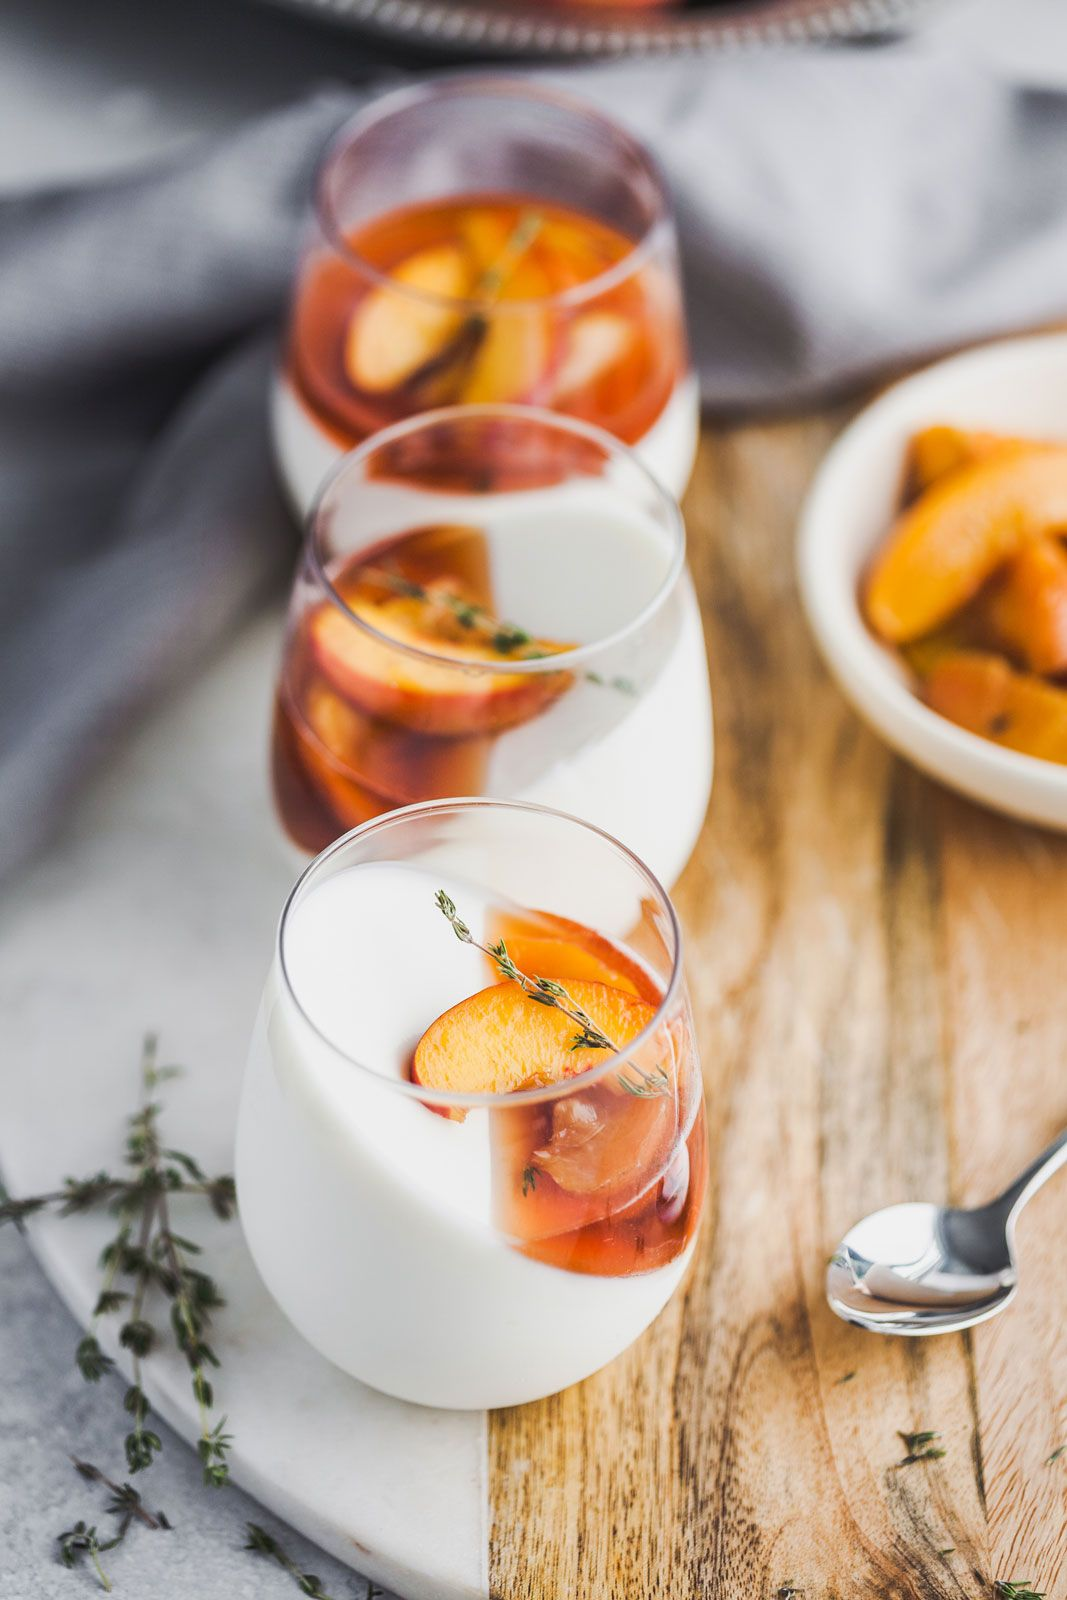 Vanilla Yoghurt Panna Cotta With Balsamic Thyme Roasted Peaches And Nectarines •Olive & Mango